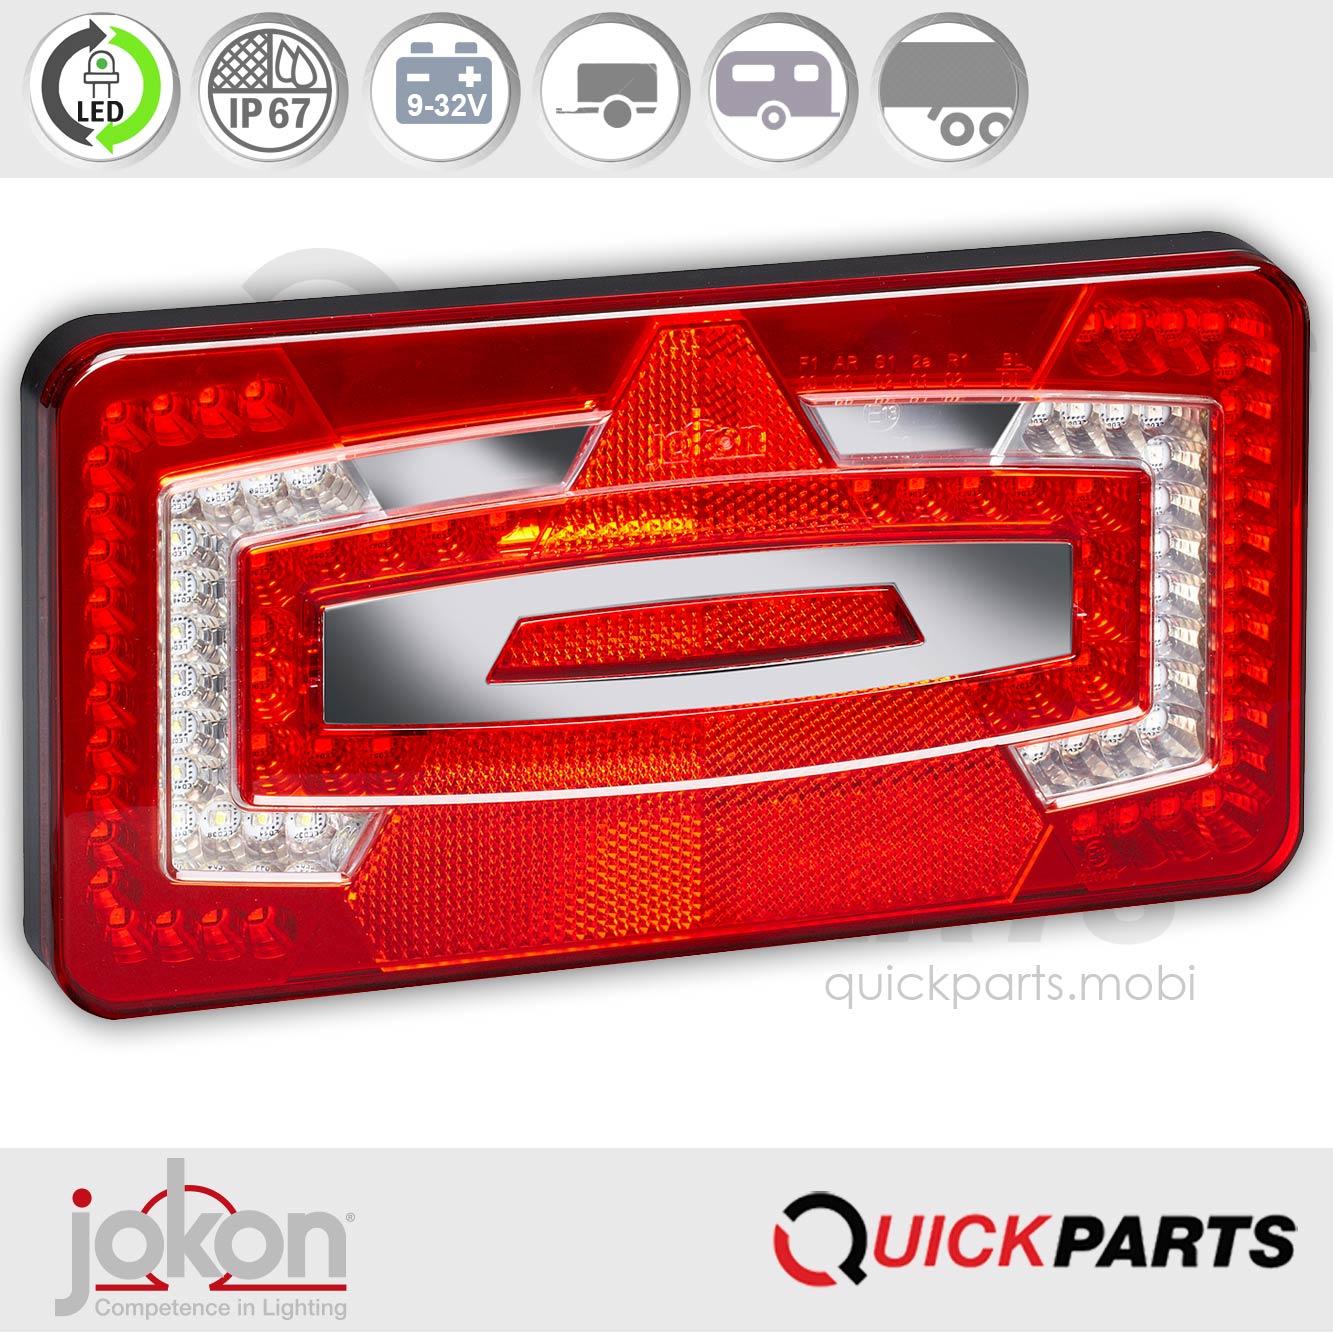 JOKON E13-13359 EMV / EMC